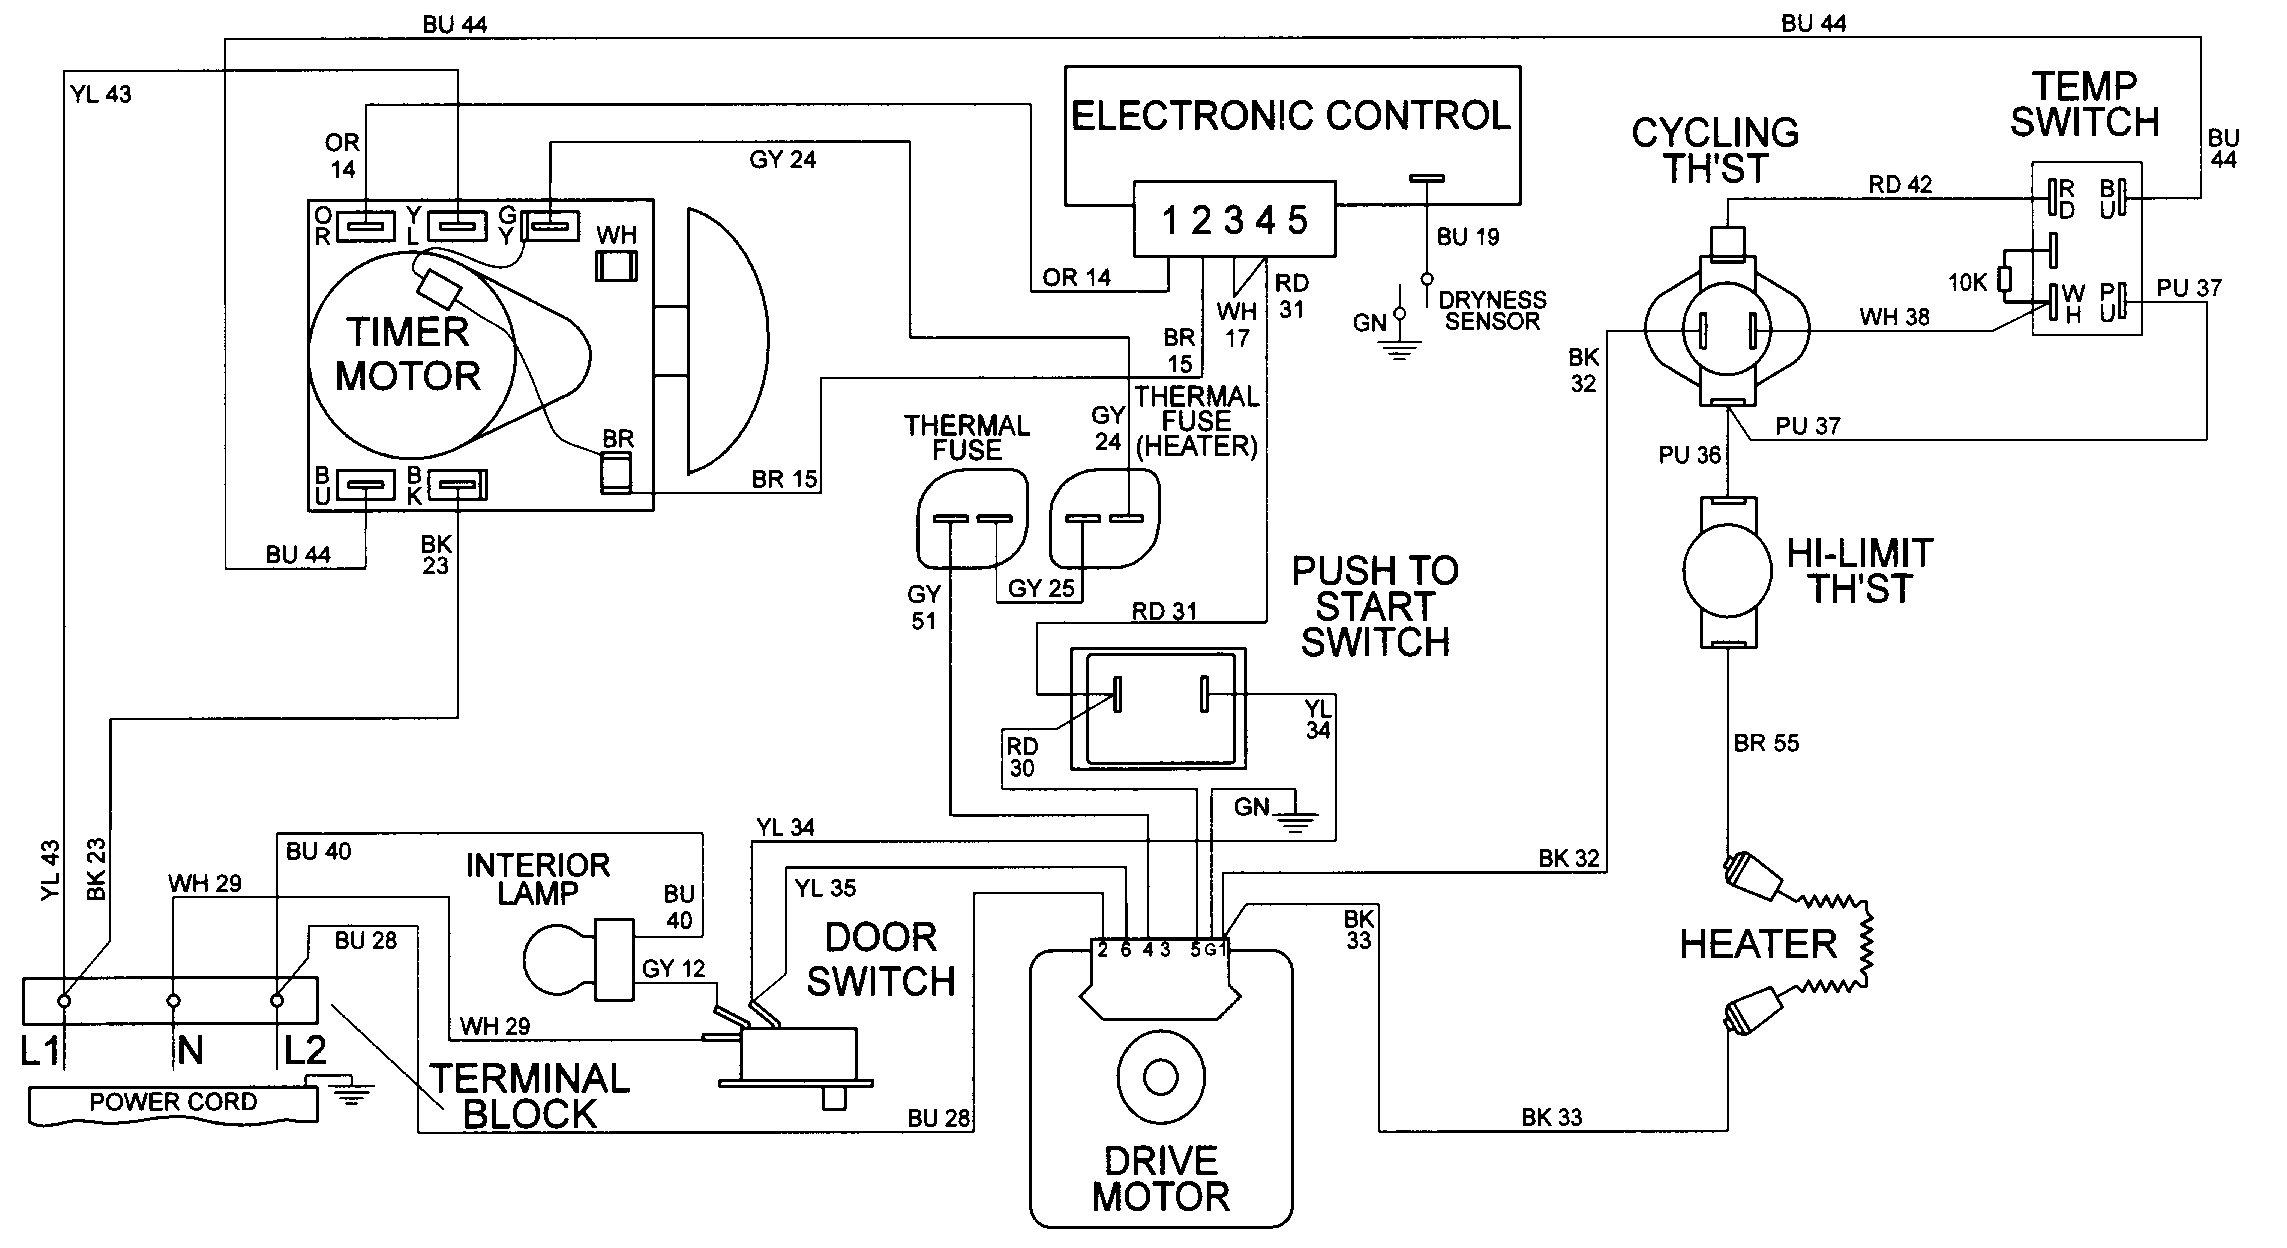 hight resolution of maytag mde9606azw wiring information diagram